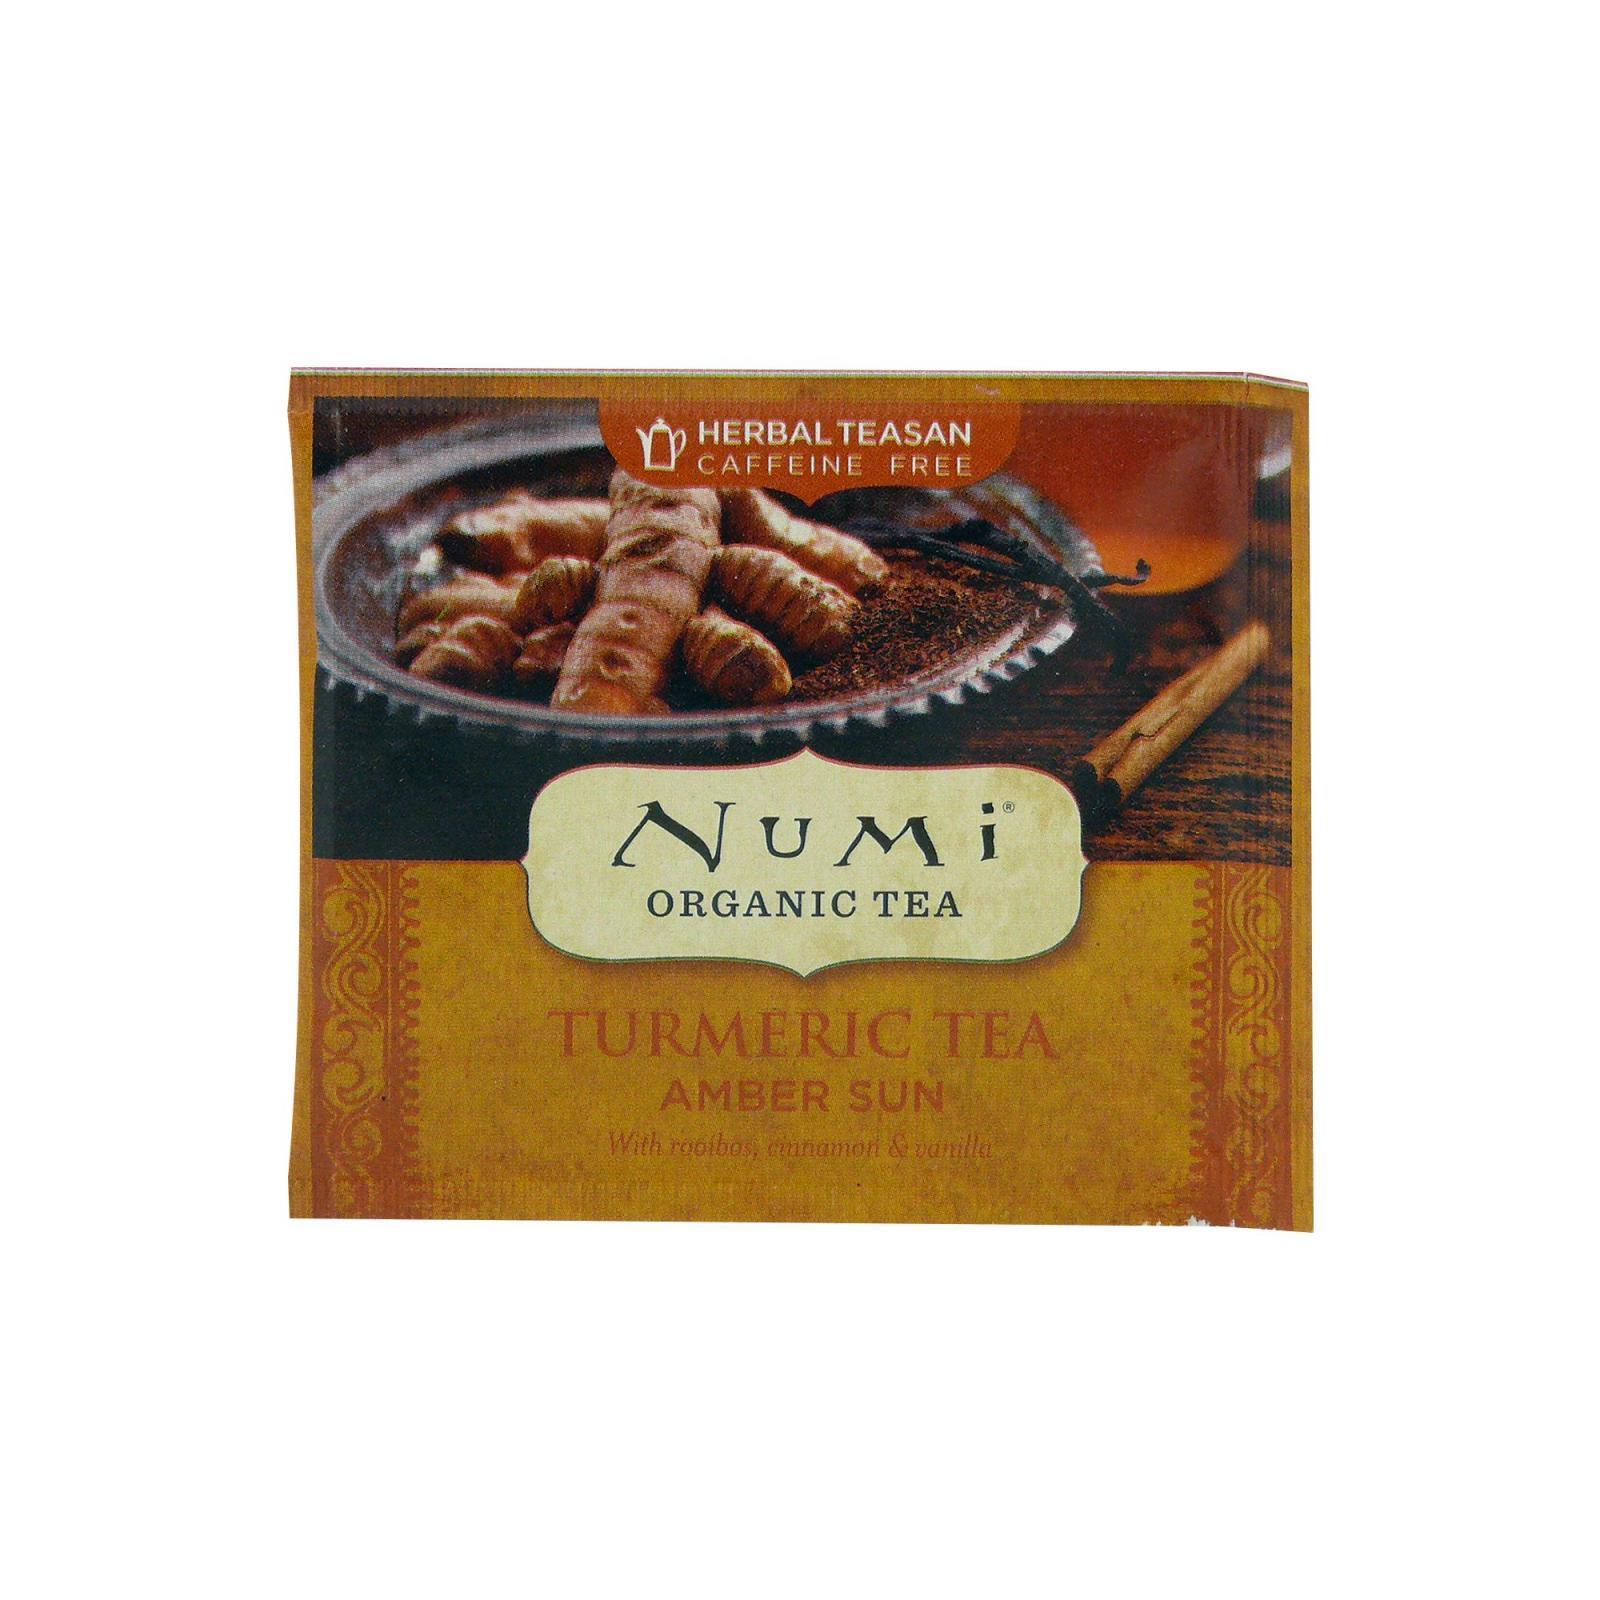 Numi Organic Tea Kořeněný čaj Amber Sun, Turmeric Tea 3,45 g, 1 ks